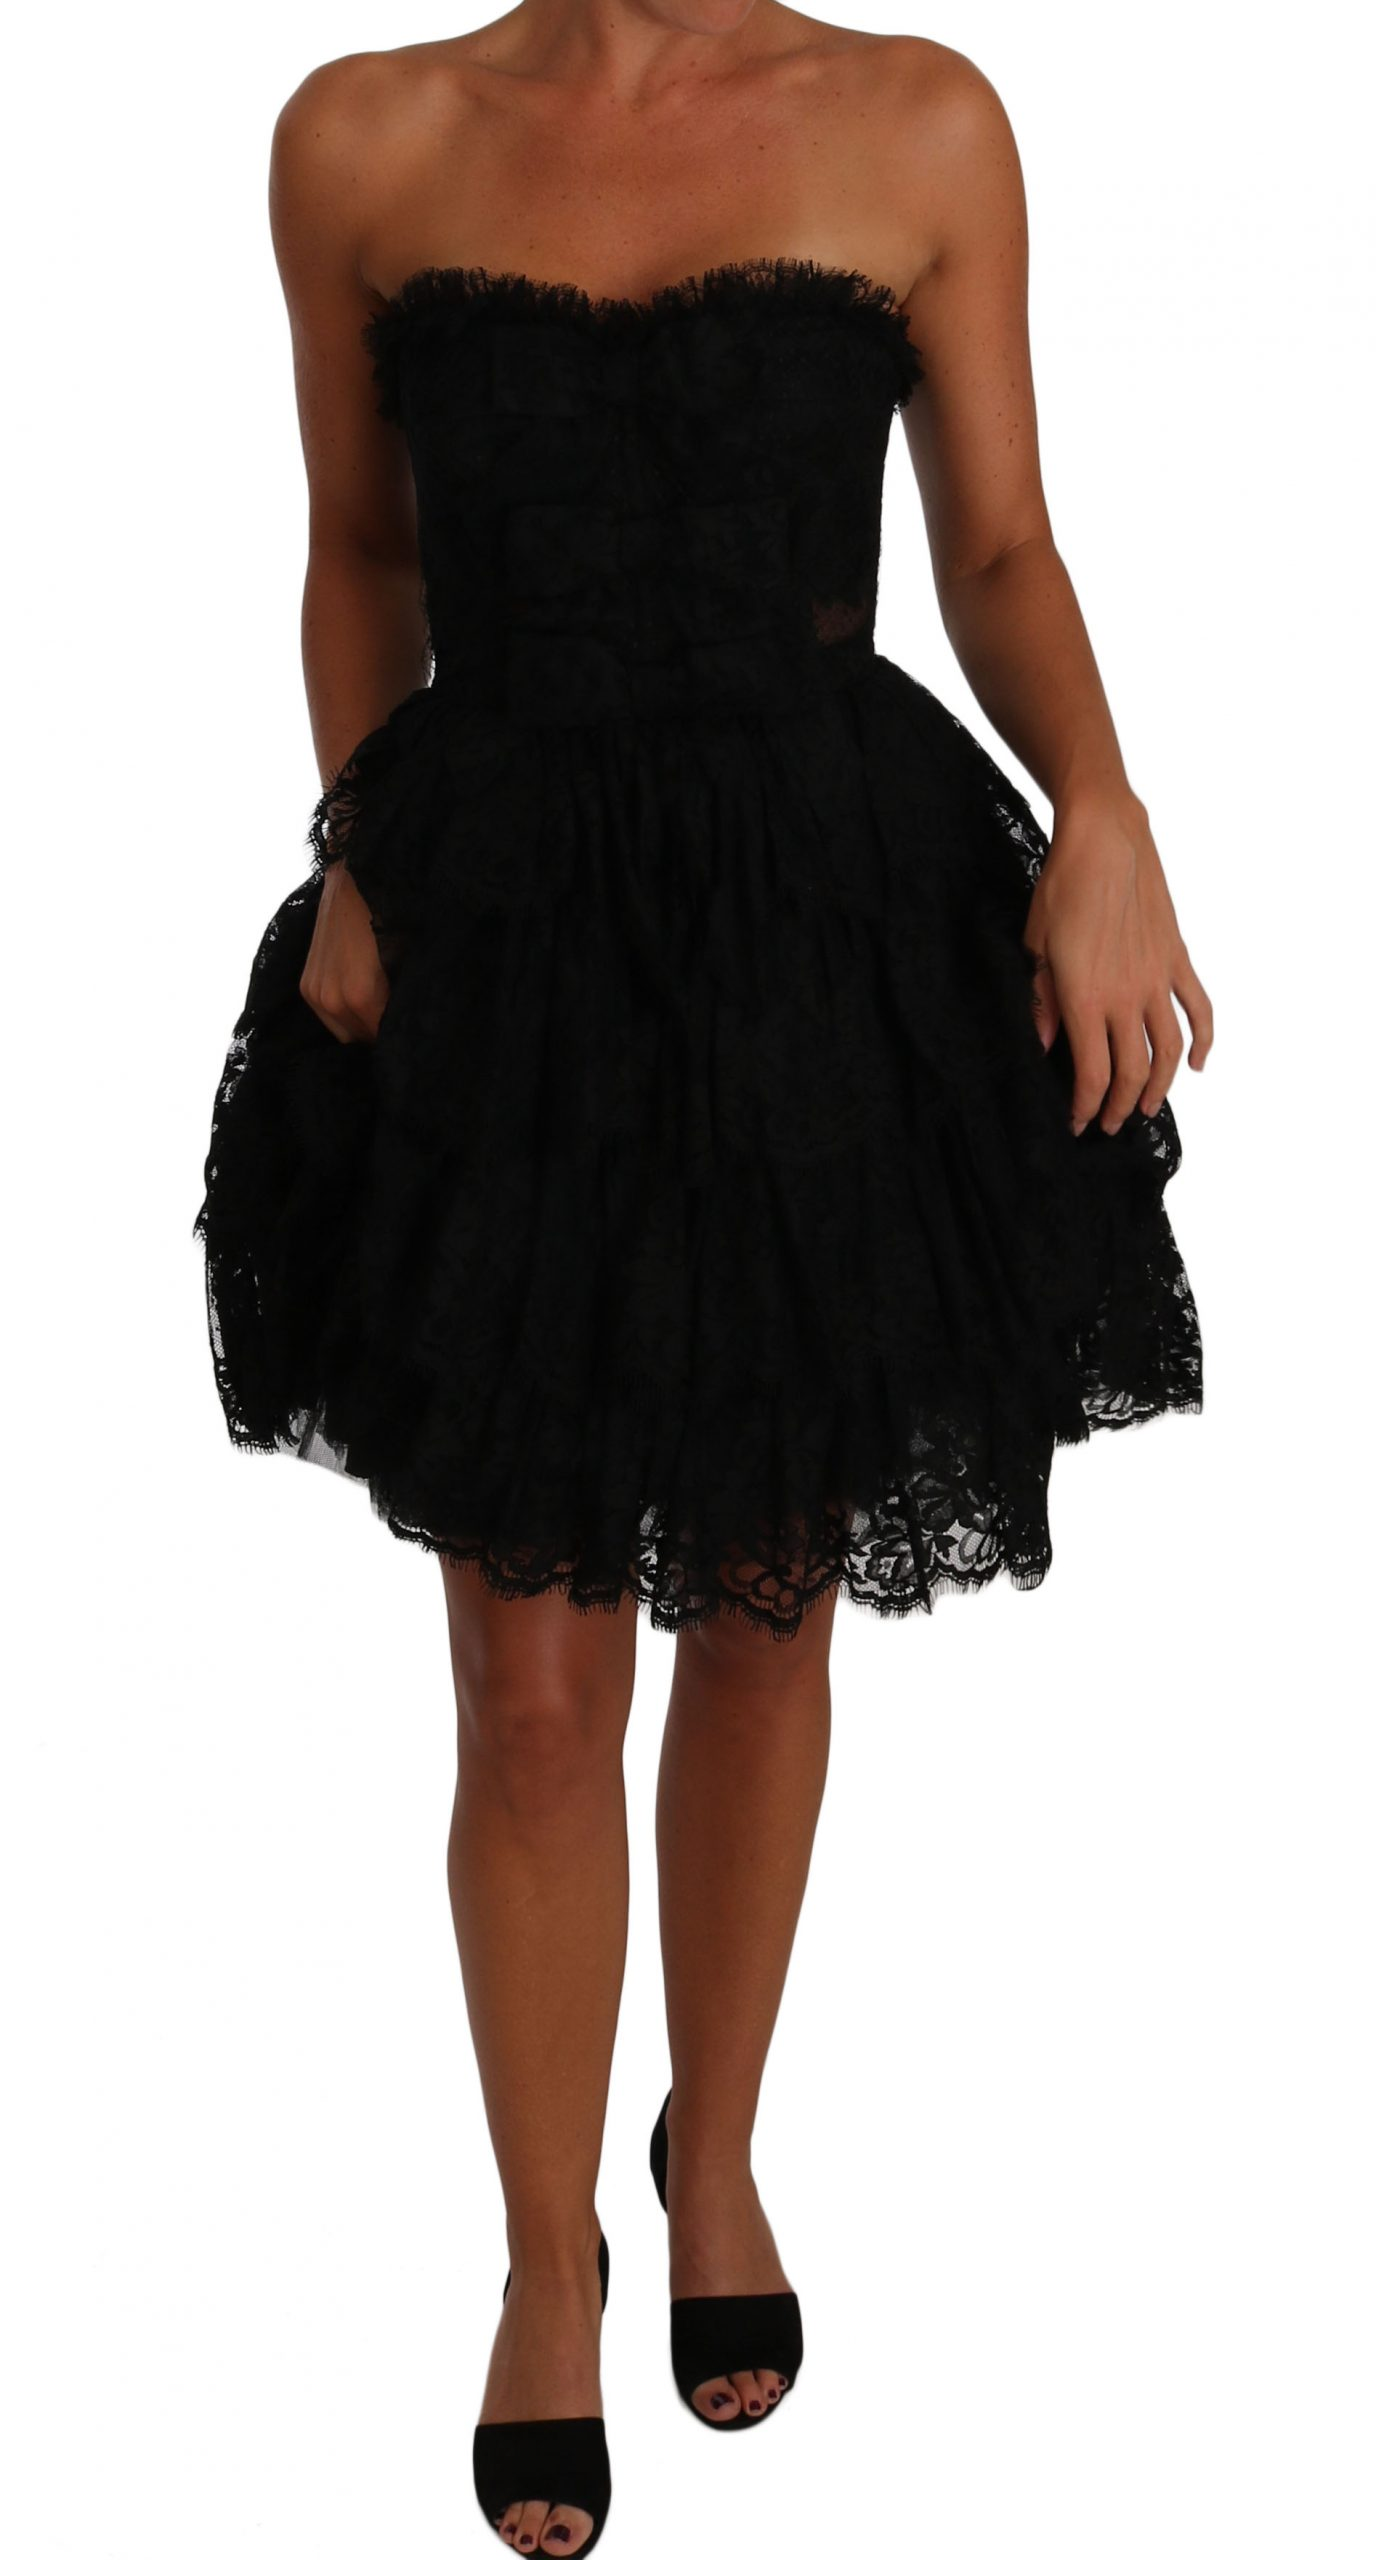 Dolce & Gabbana Women's Floral Lace Ball Mini Ruffle Dress Black DR1507 - IT38|XS